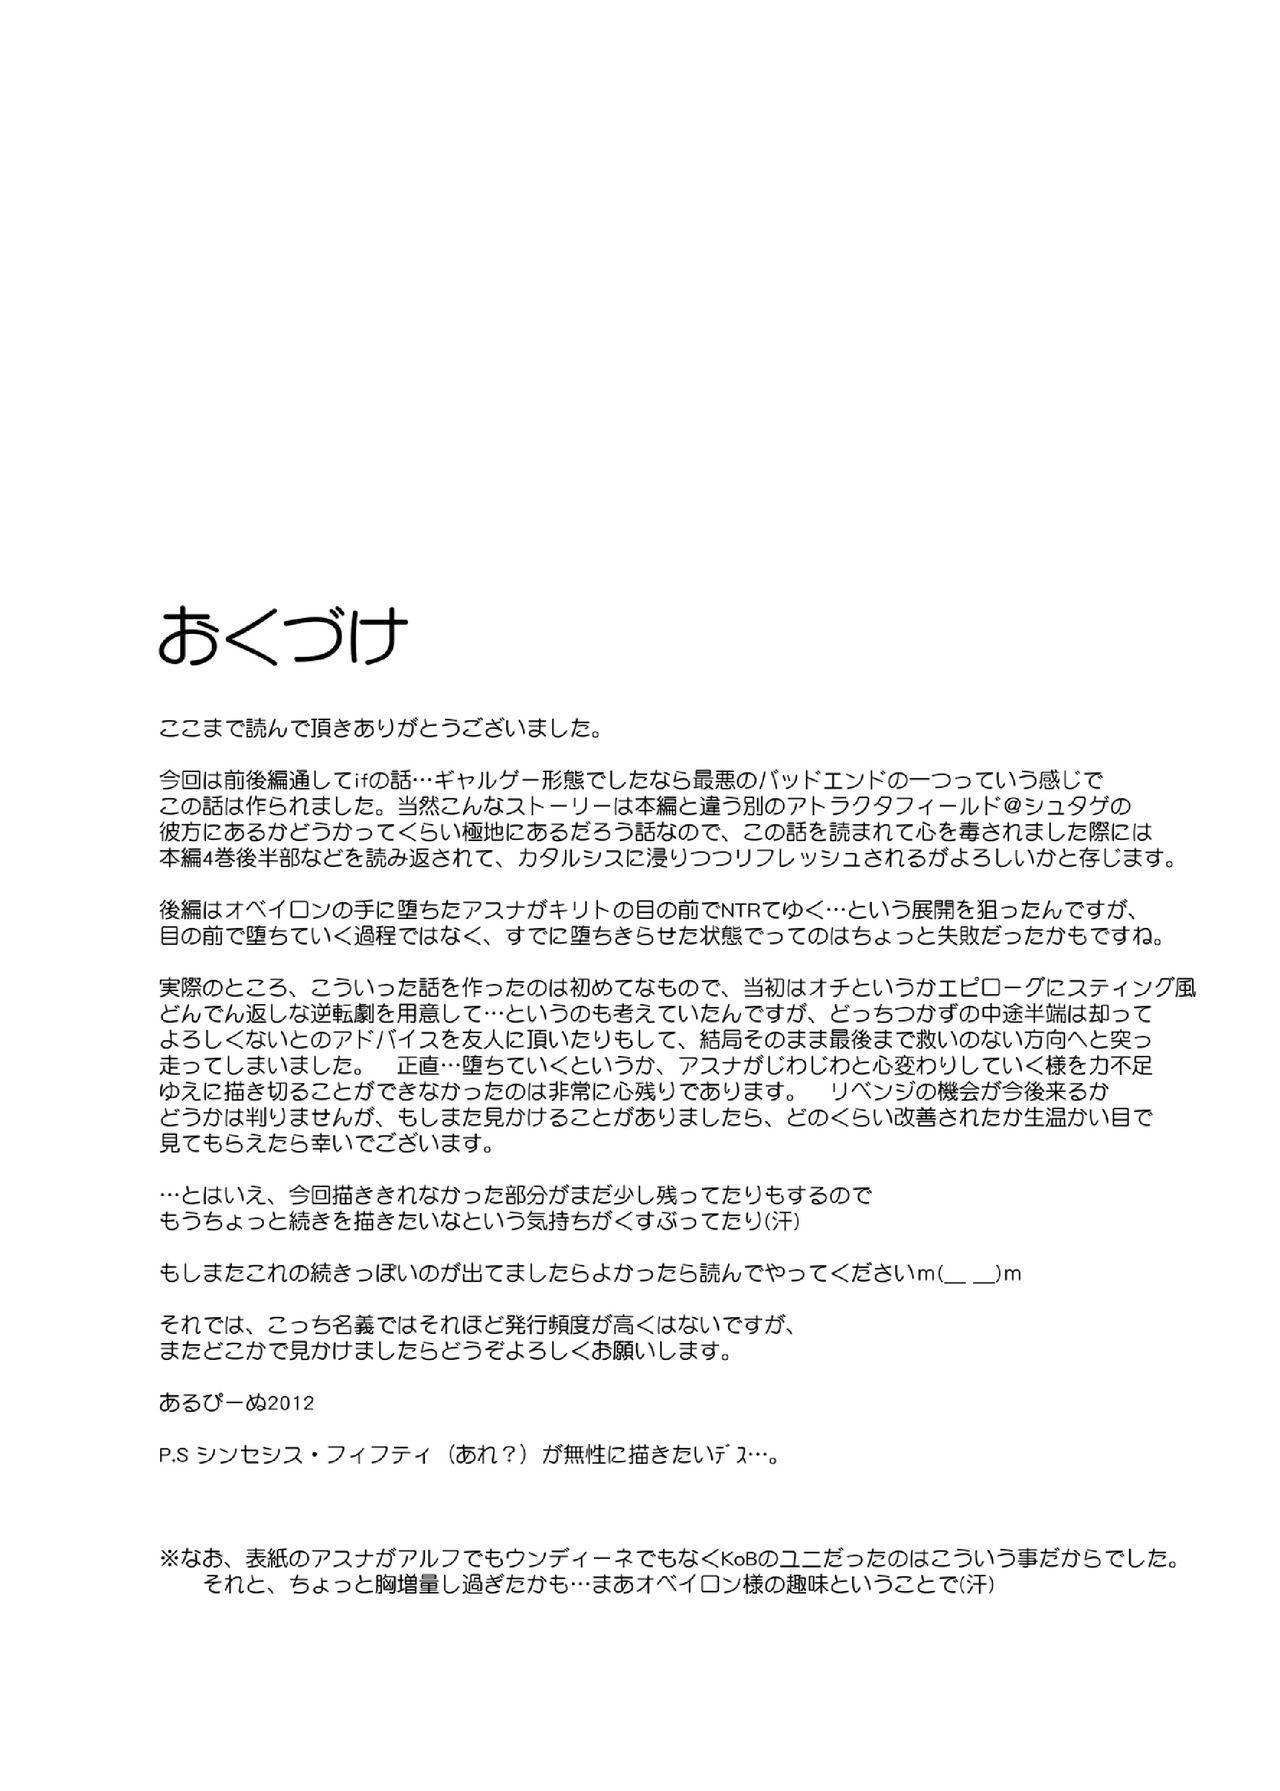 Slave Asuna On-Demand #002. PLEASURE SLAVE. 39